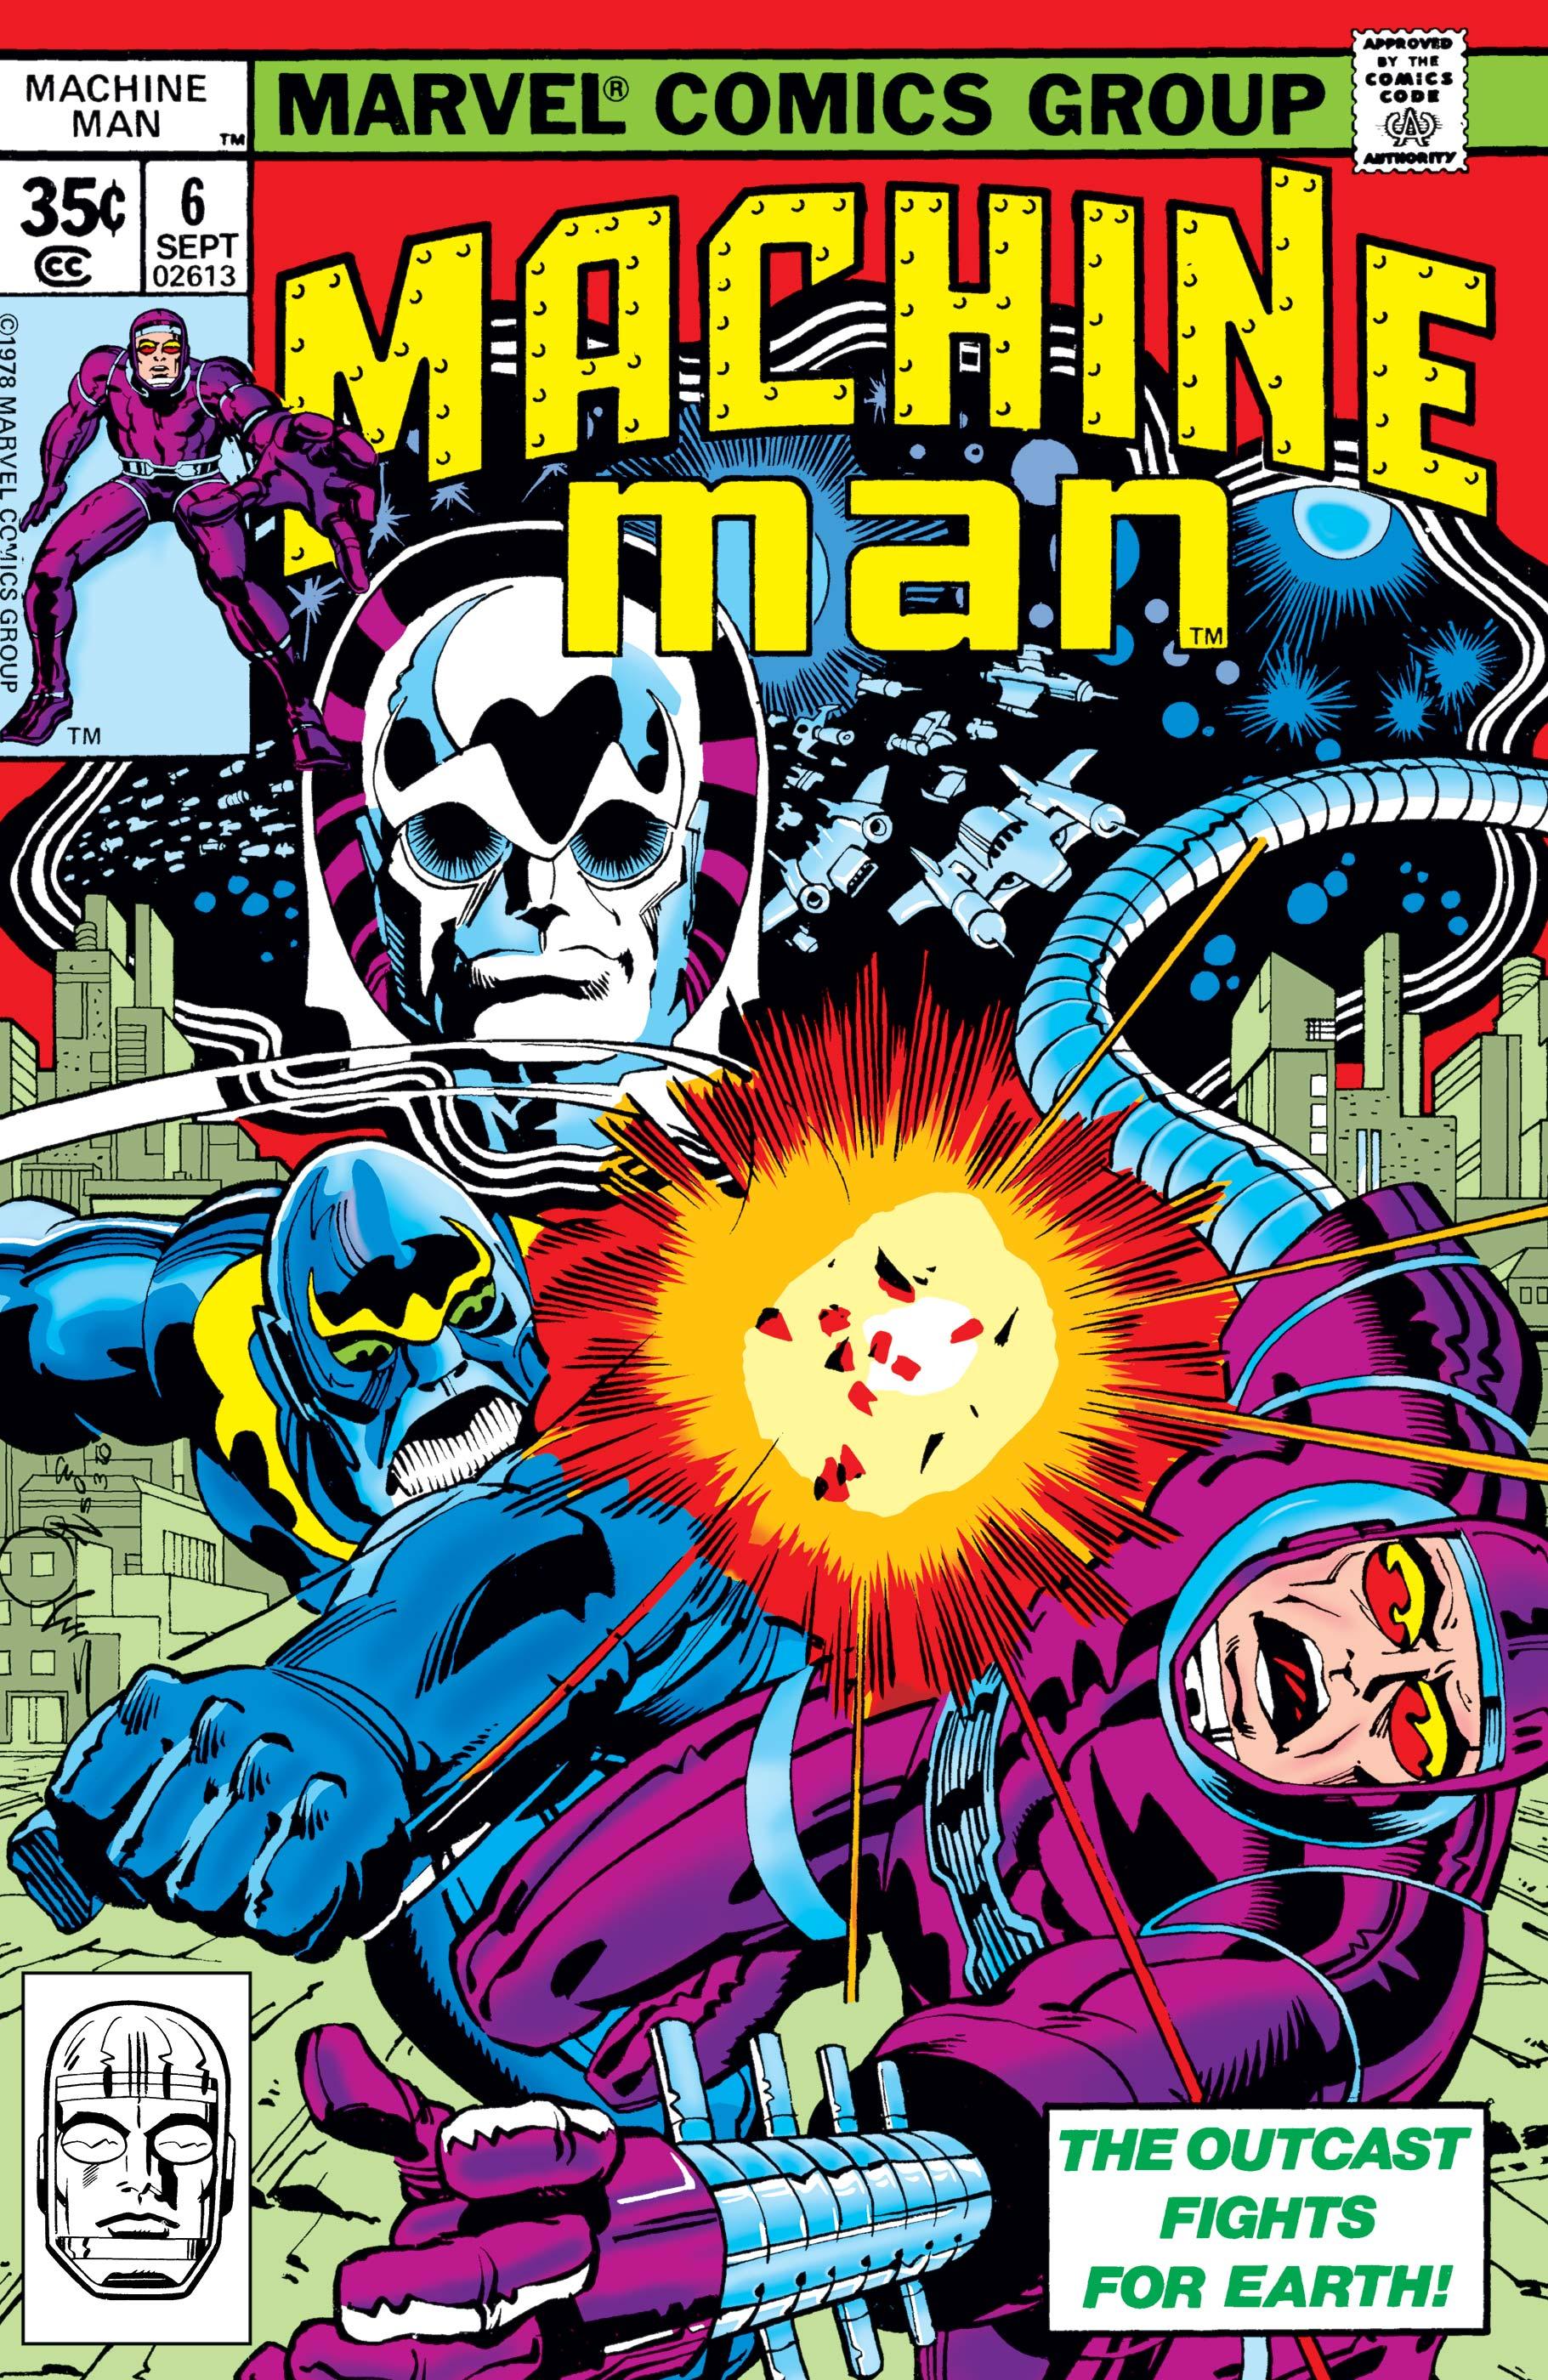 Machine Man (1978) #6